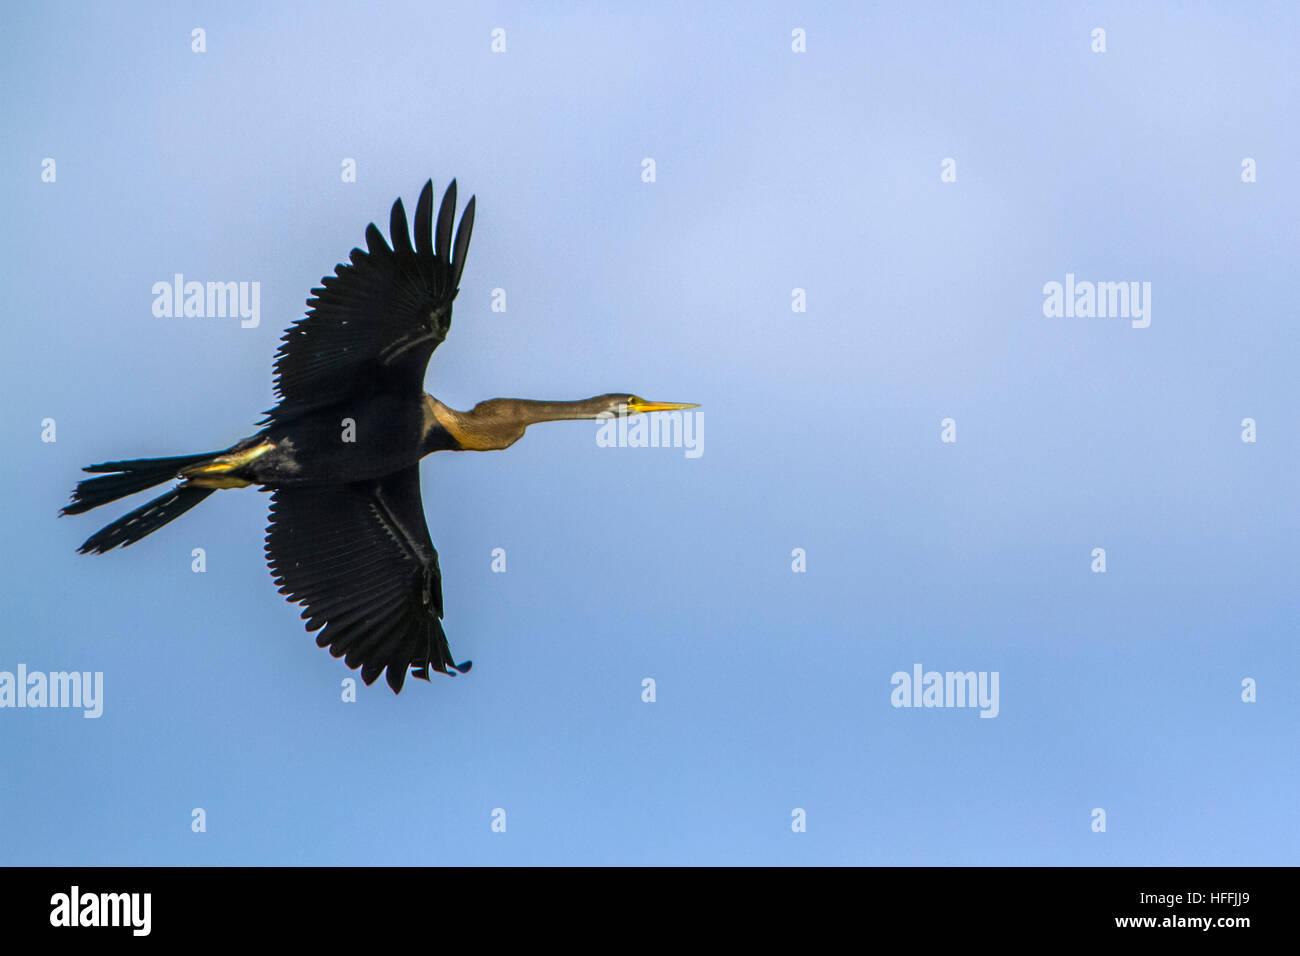 Oriental darter  flying isolated in blue sky ; specie Anhinga melanogaster  family of Anhingidae - Stock Image